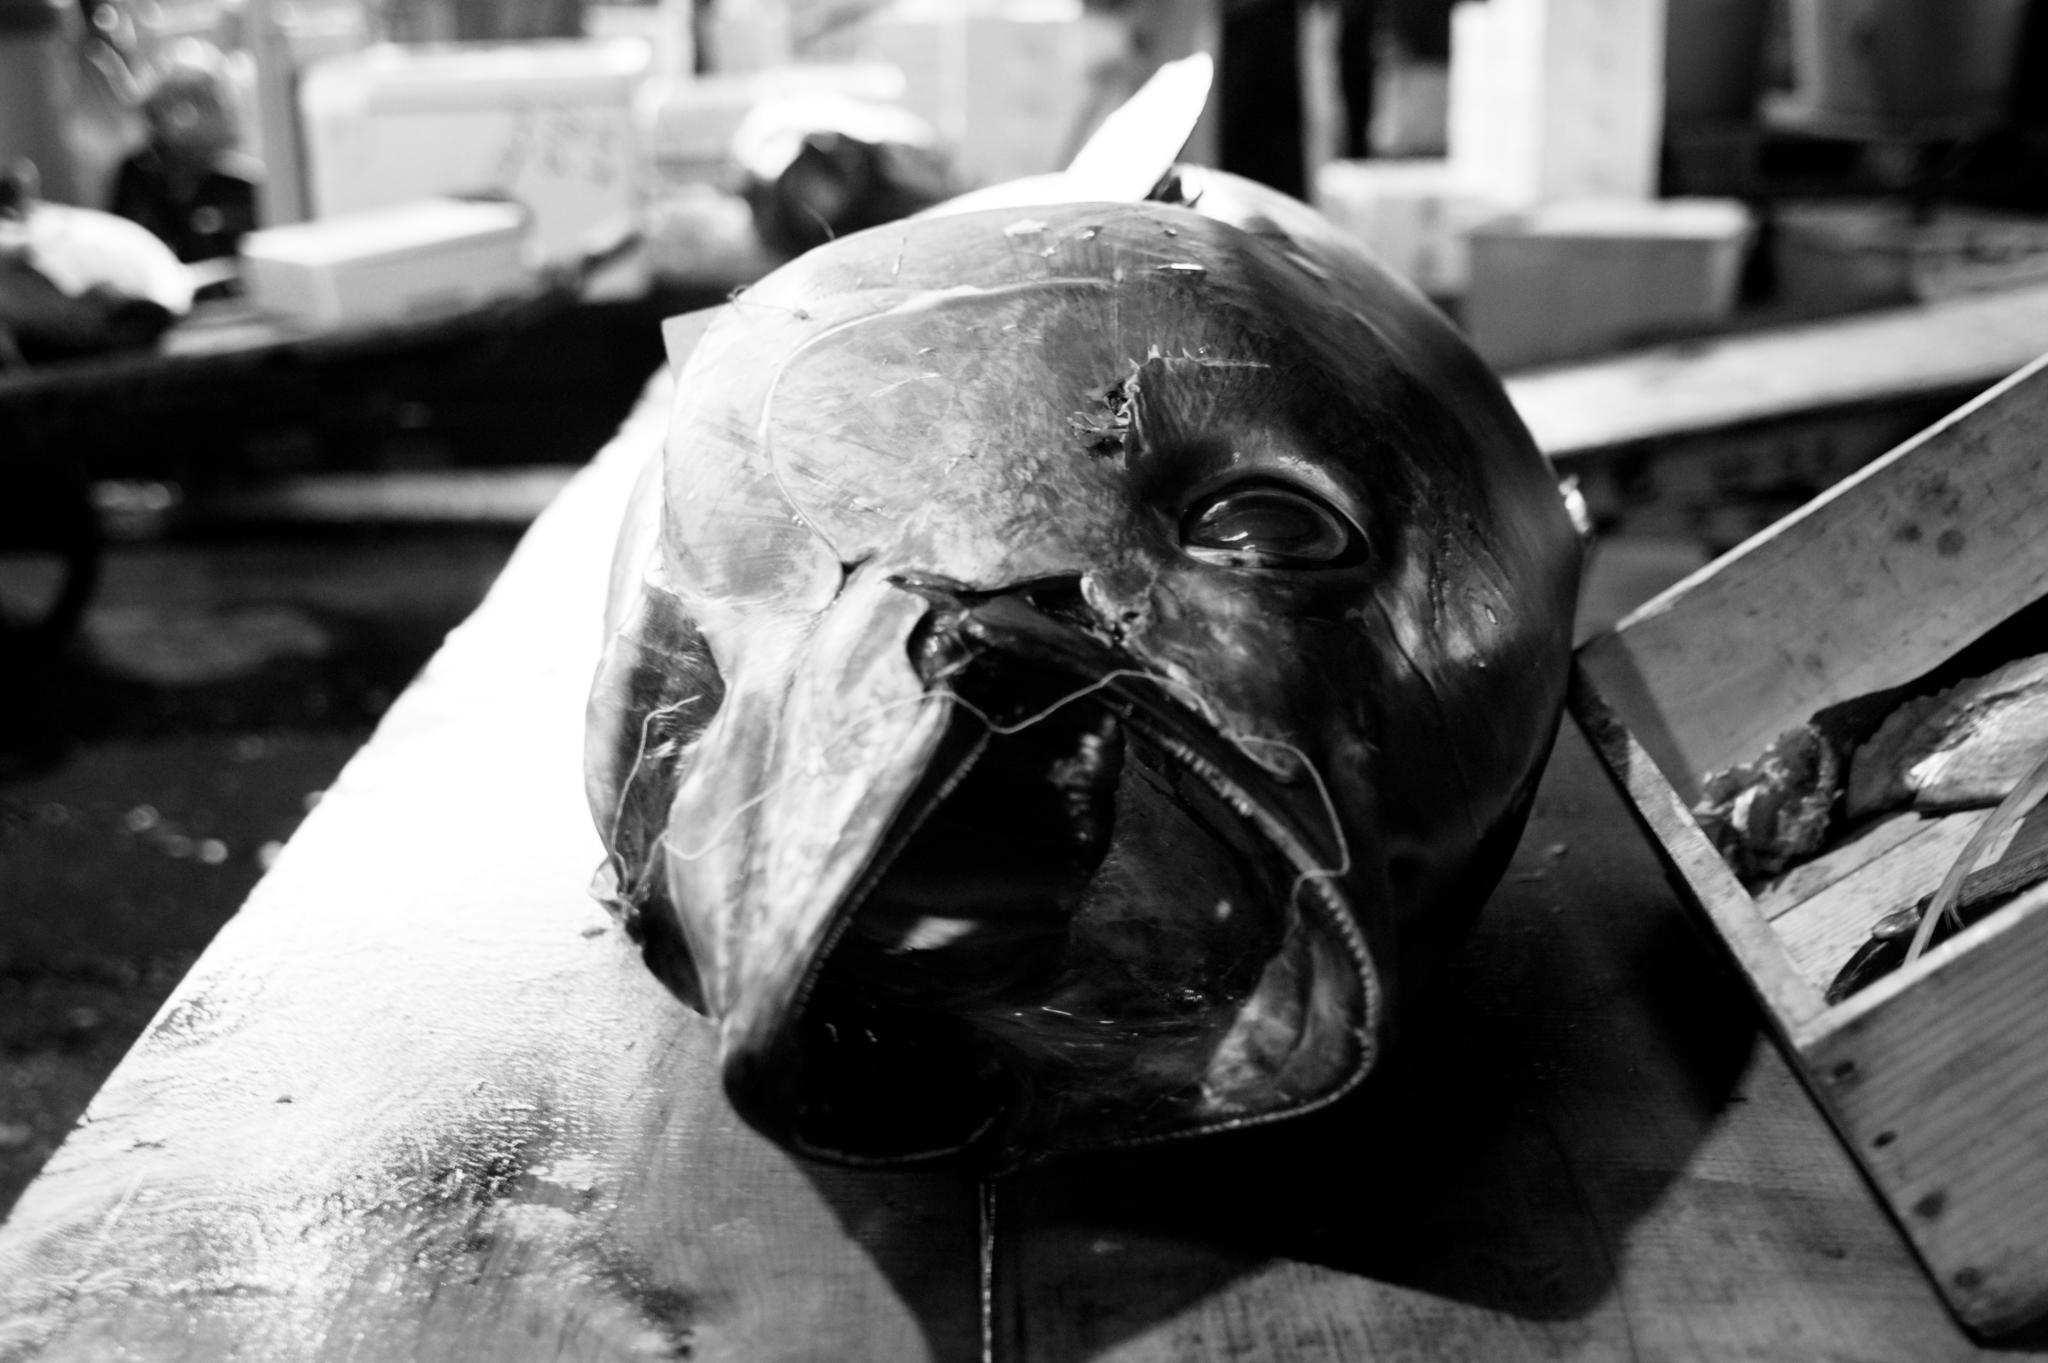 06102019_galeria-tsukiji Rahim Packir Saibo.jpg